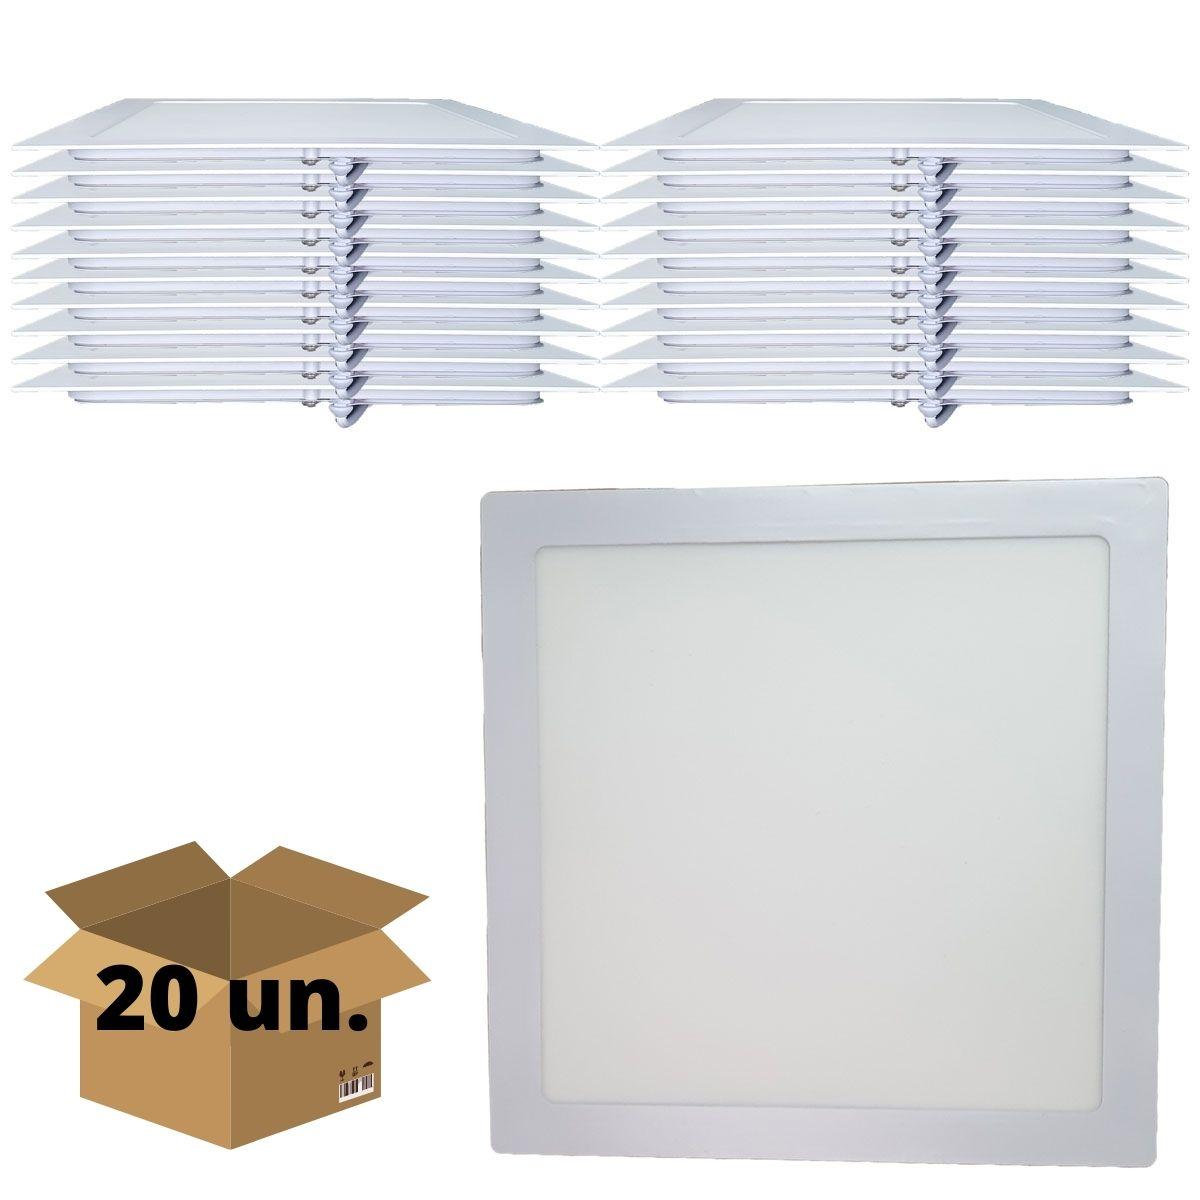 KIT 20 Painel Plafon LED 24w Quadrado Embutir Branco Frio Luminária